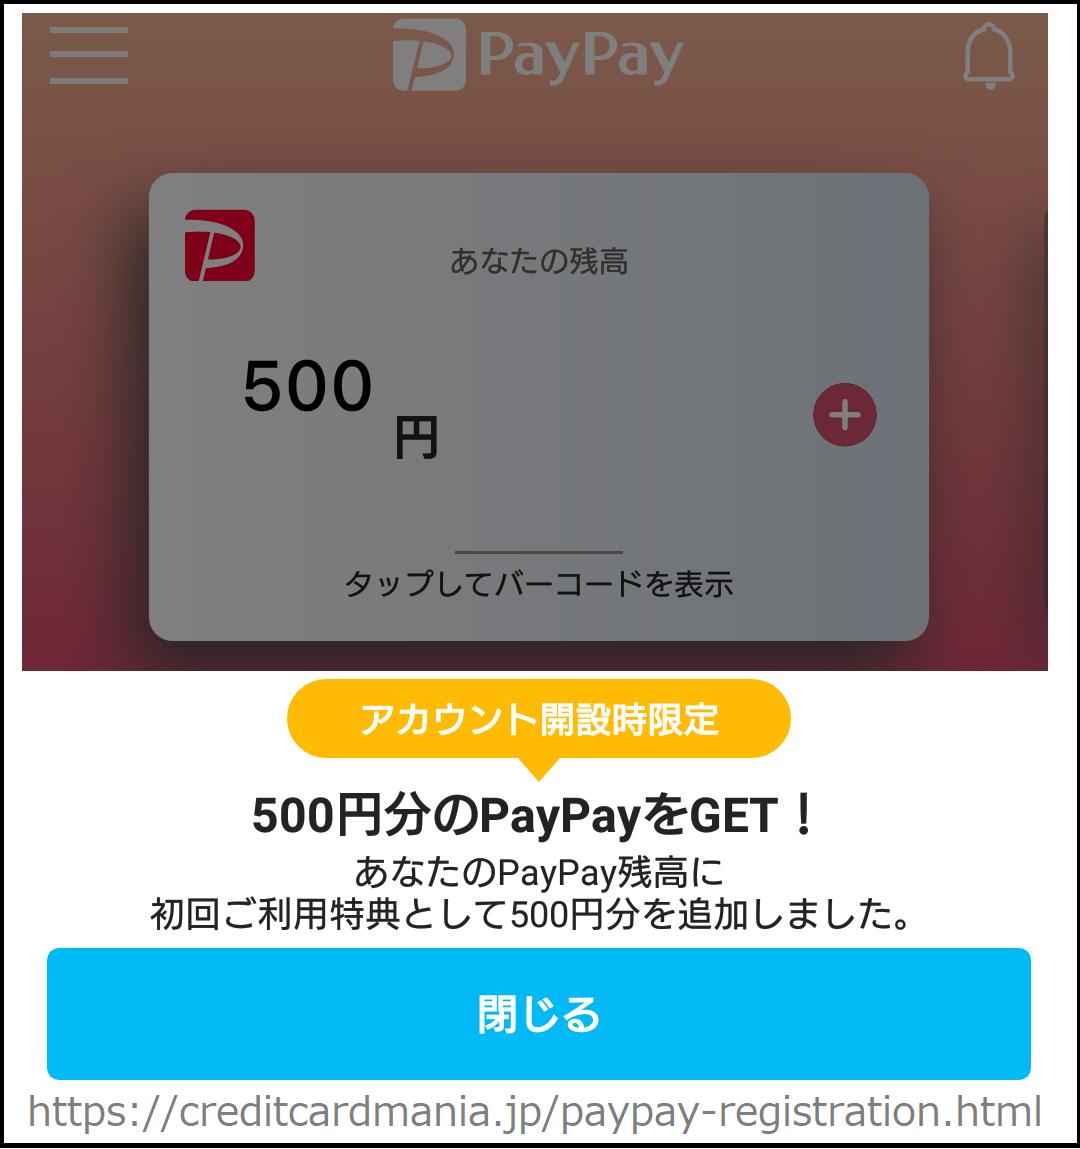 PayPayに登録が完了し500円分の電子マネーをプレゼントされた